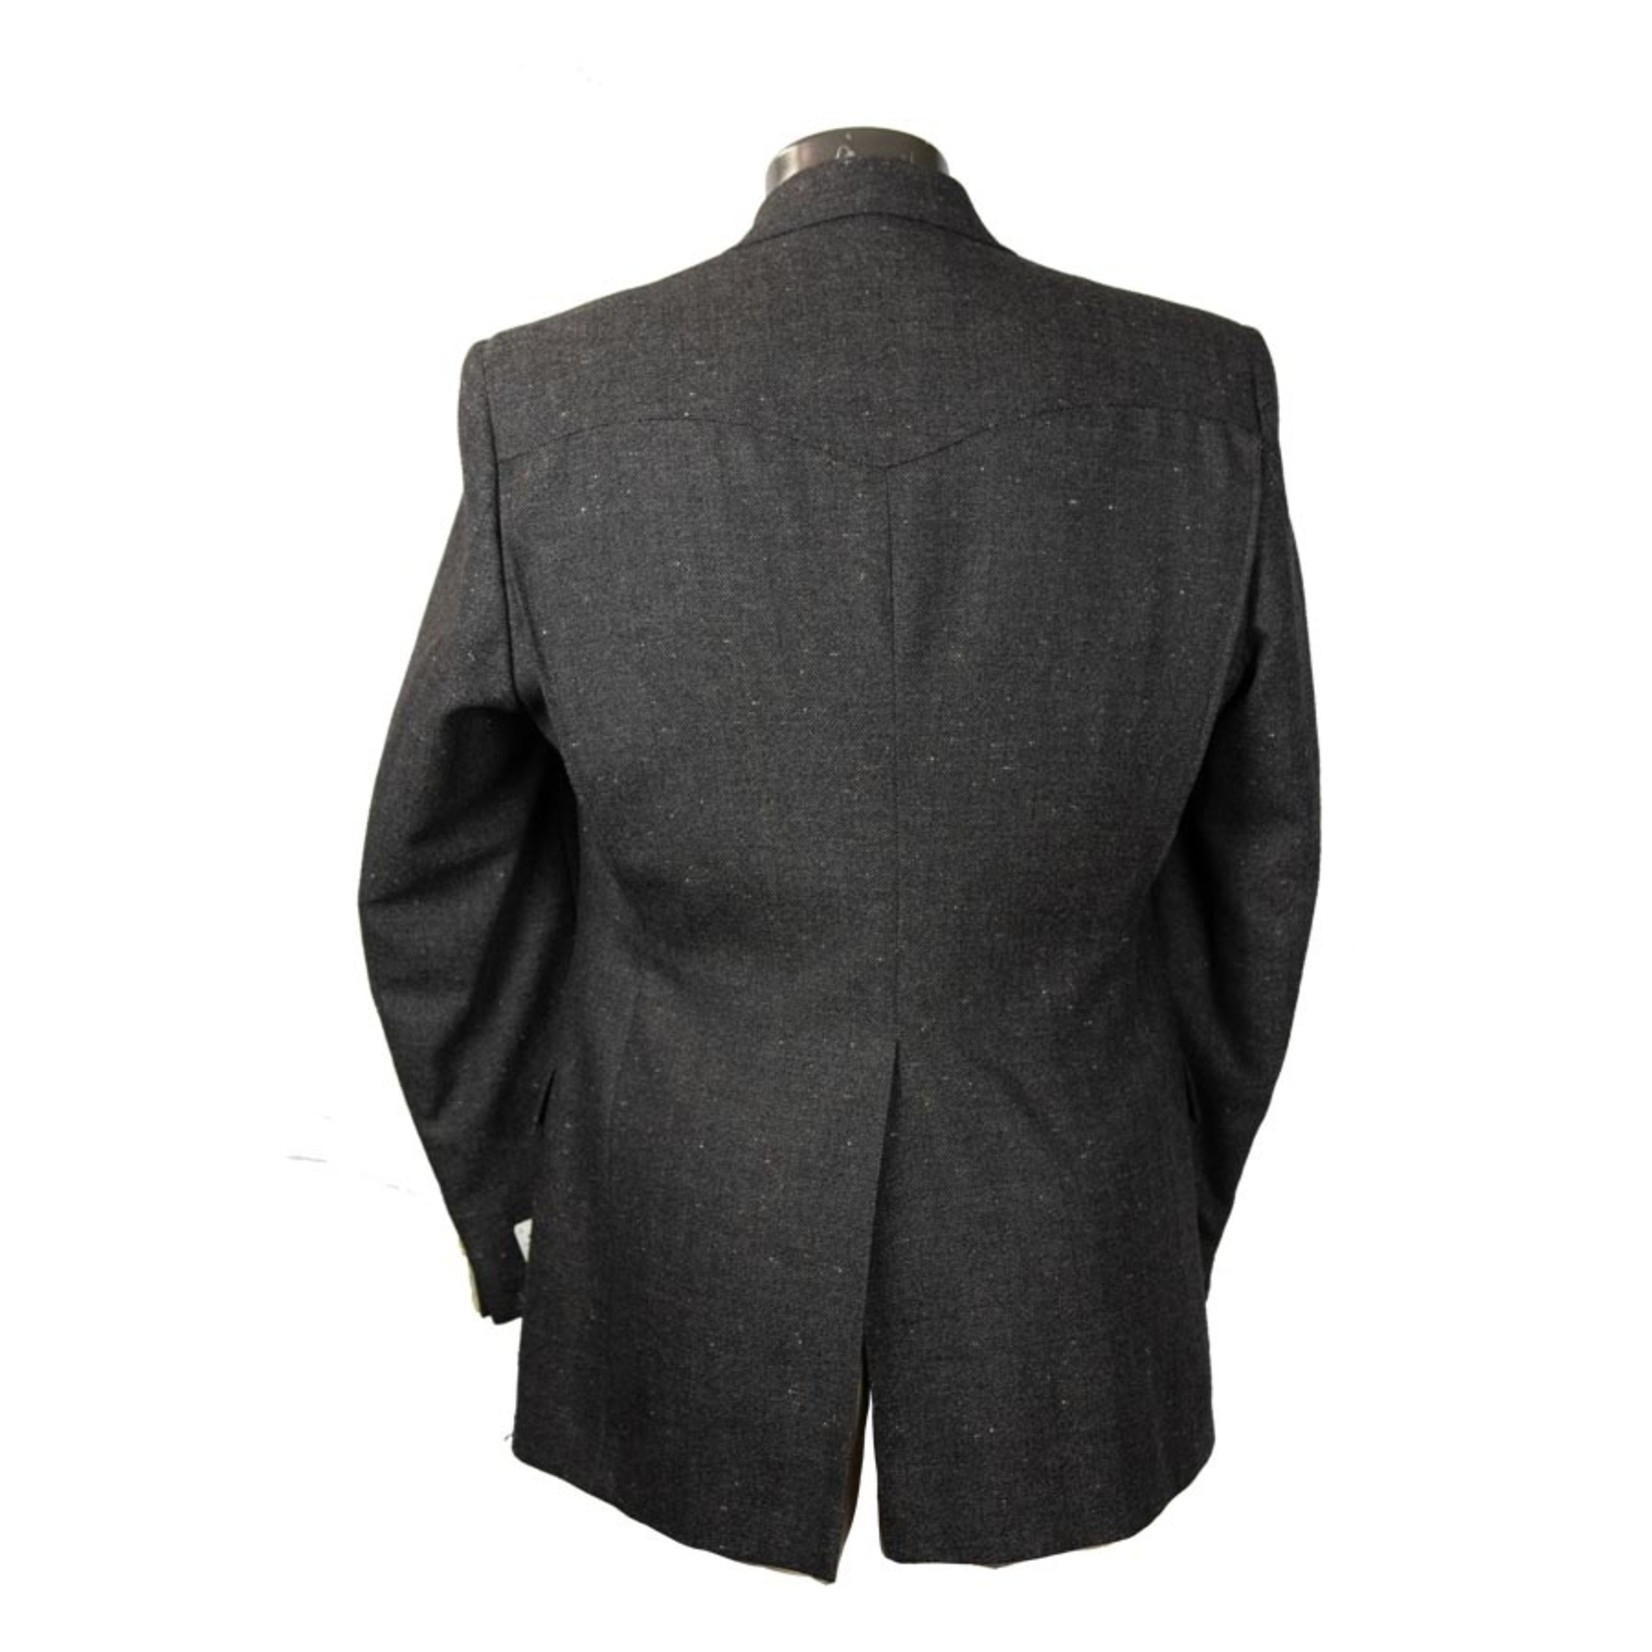 Admiration Wool Polyester Blend Vintage Suit Jacket - Size 40 - #23